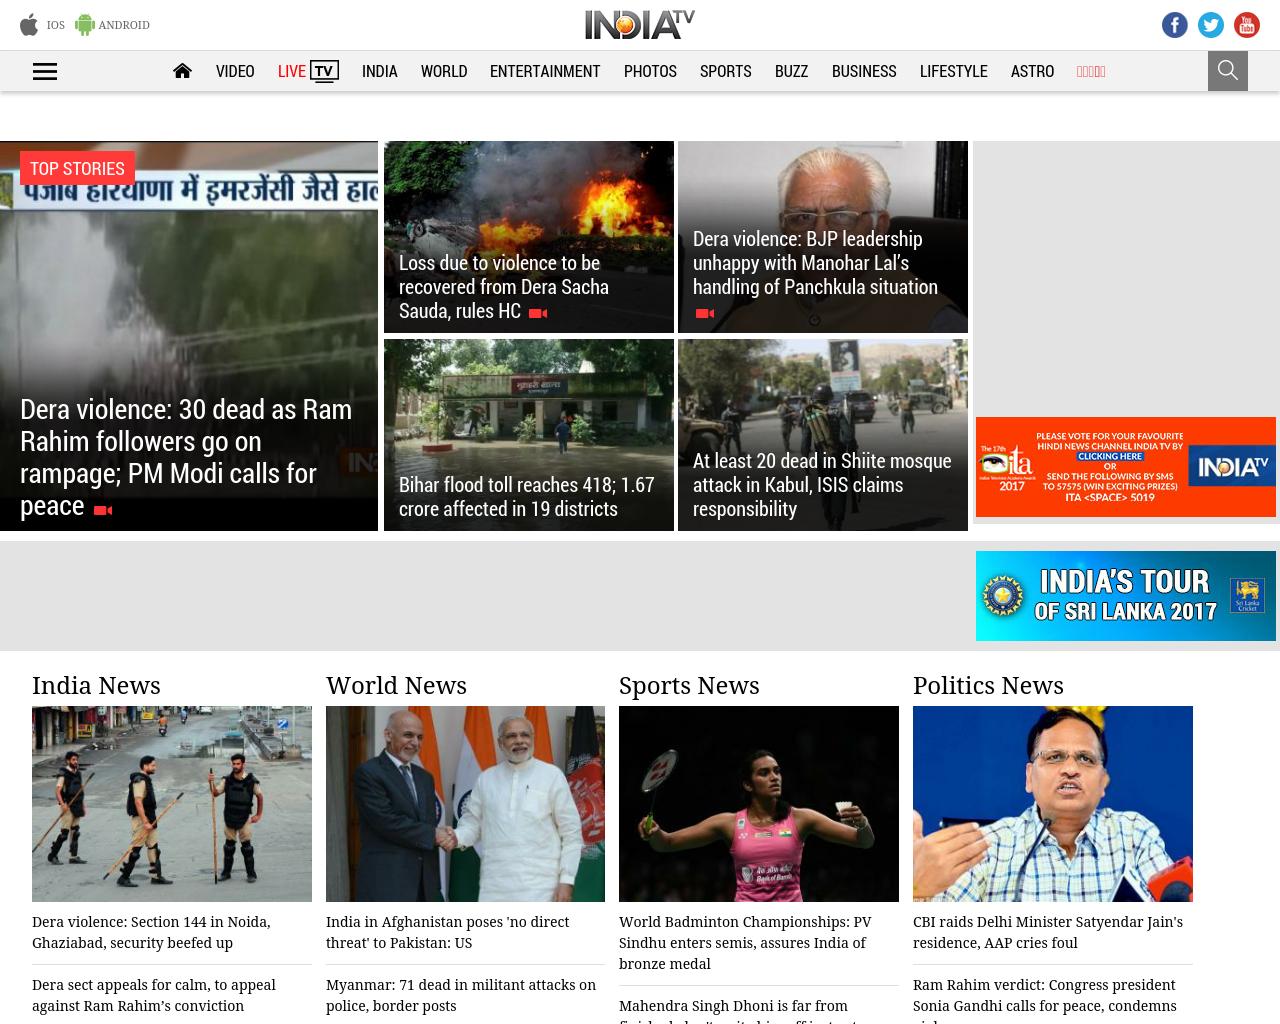 India-TV-Advertising-Reviews-Pricing